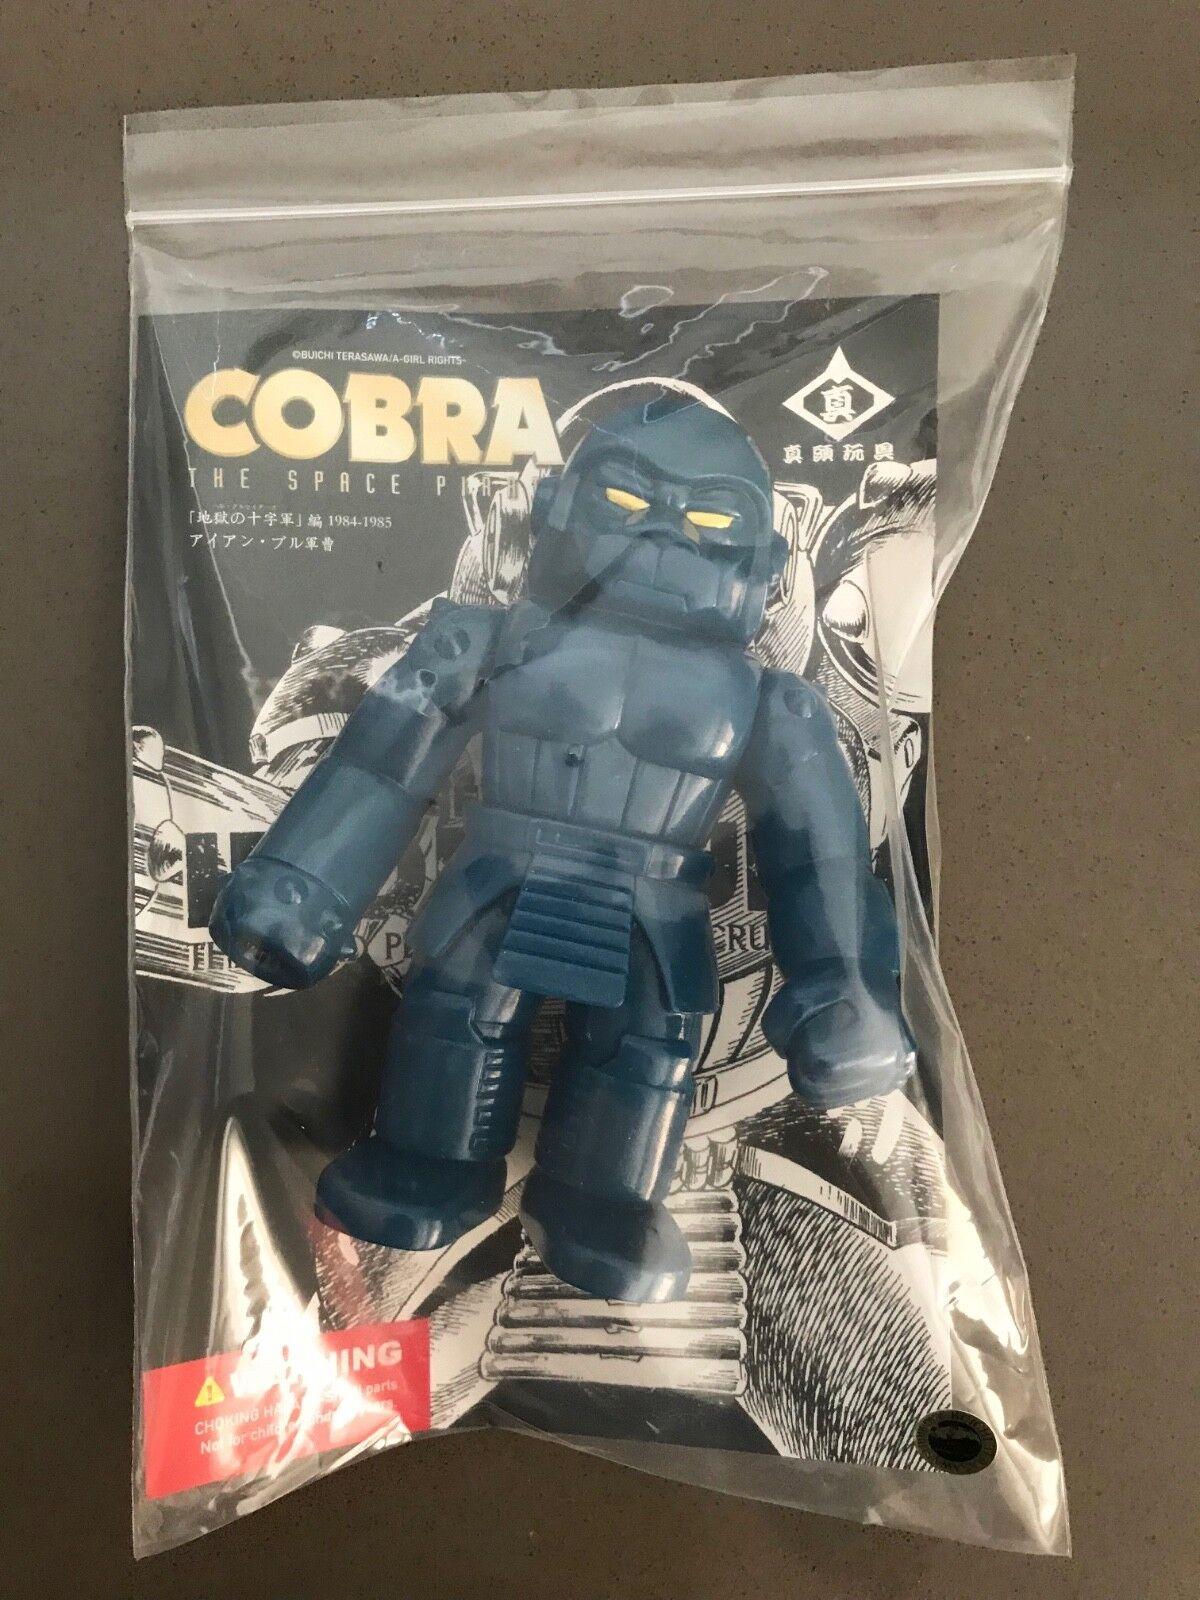 RxH bluee Robo Gorilla Bull Sergeant Cobra - kaiju vinyl RealxHead sofubi ape